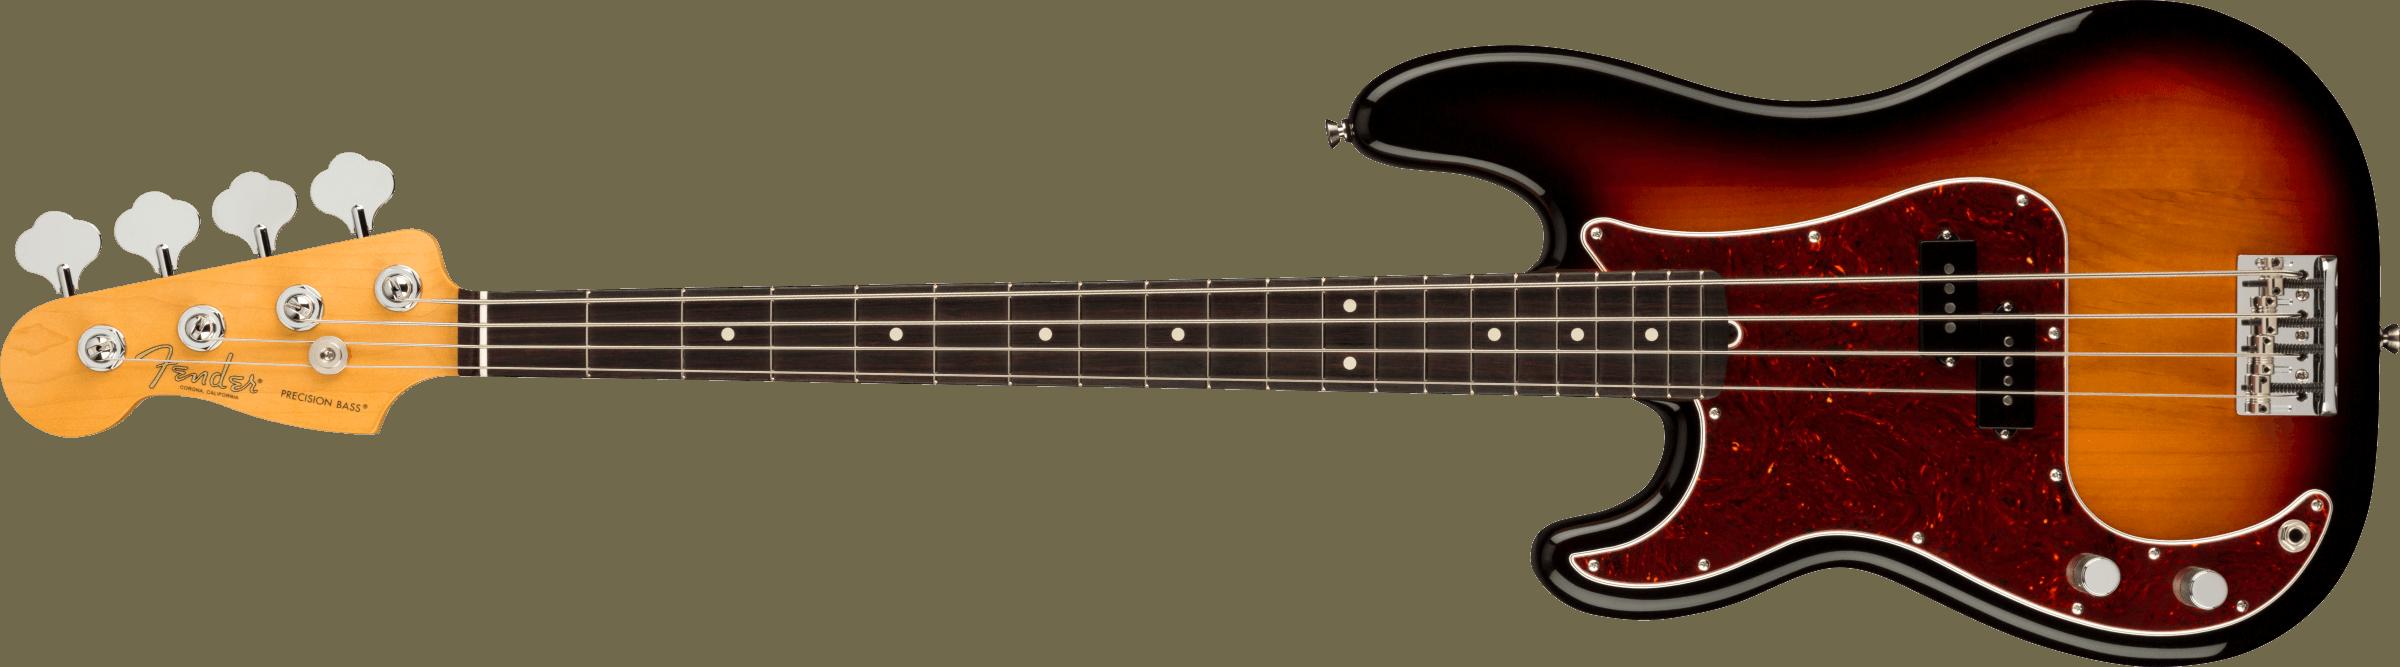 FENDER-American-Professional-II-Precision-Bass-Left-Hand-Rosewood-Fingerboard-3-Color-Sunburst-sku-571005279